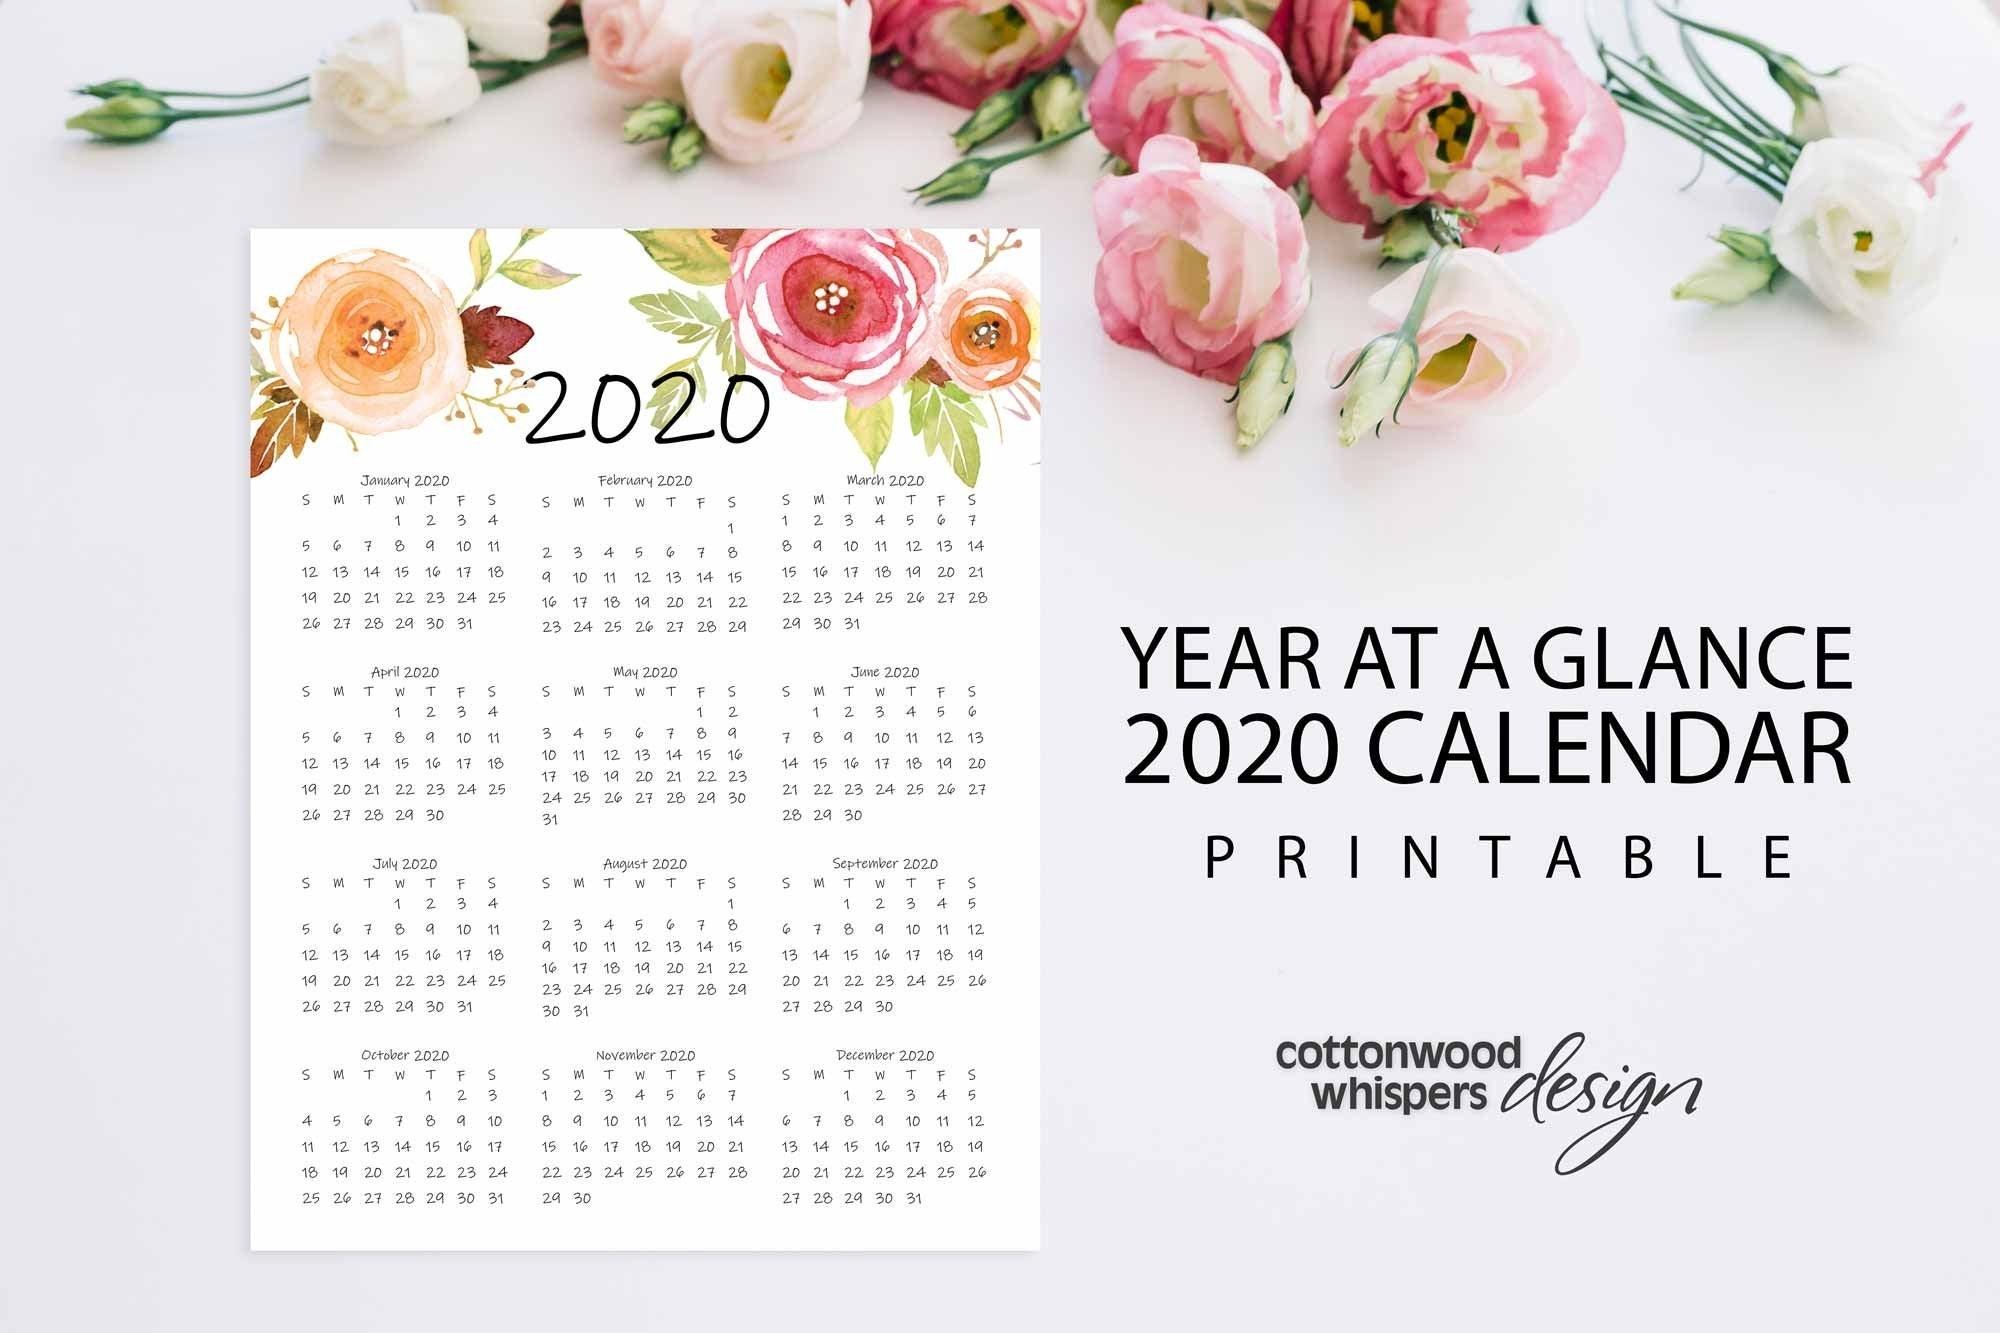 Year At A Glance Calendar 2020 Printable Calendar Letter | Etsy within 2020 Printable Calendar 8.5 X 11 Free